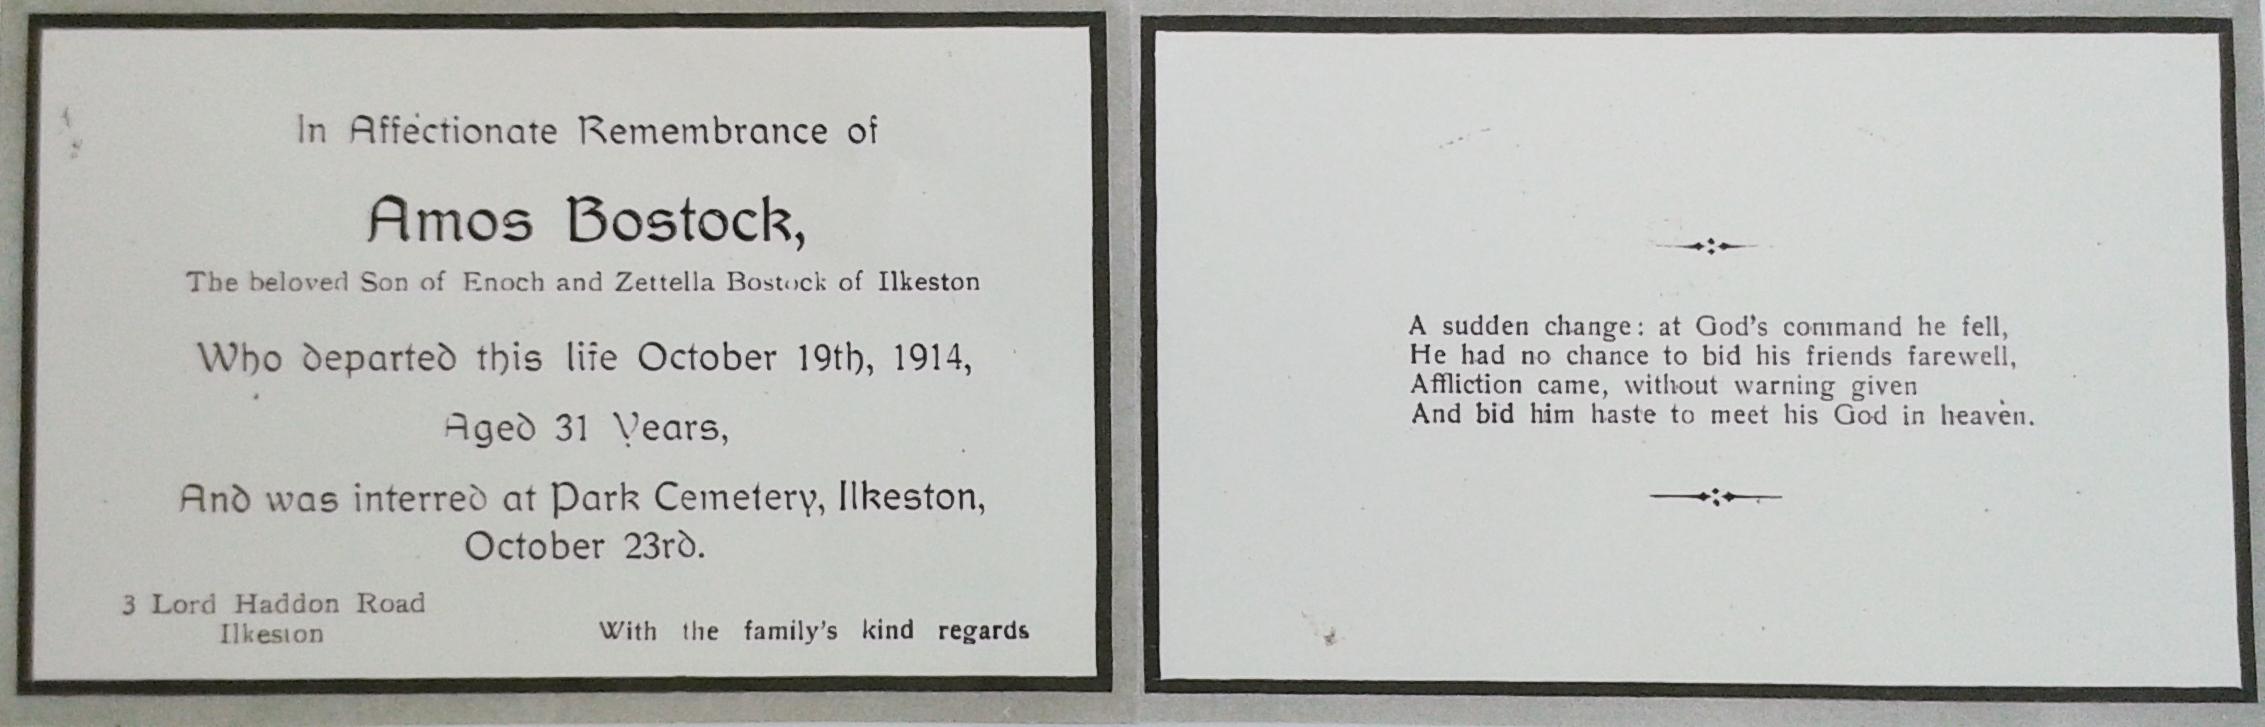 Amos Bostock card 13